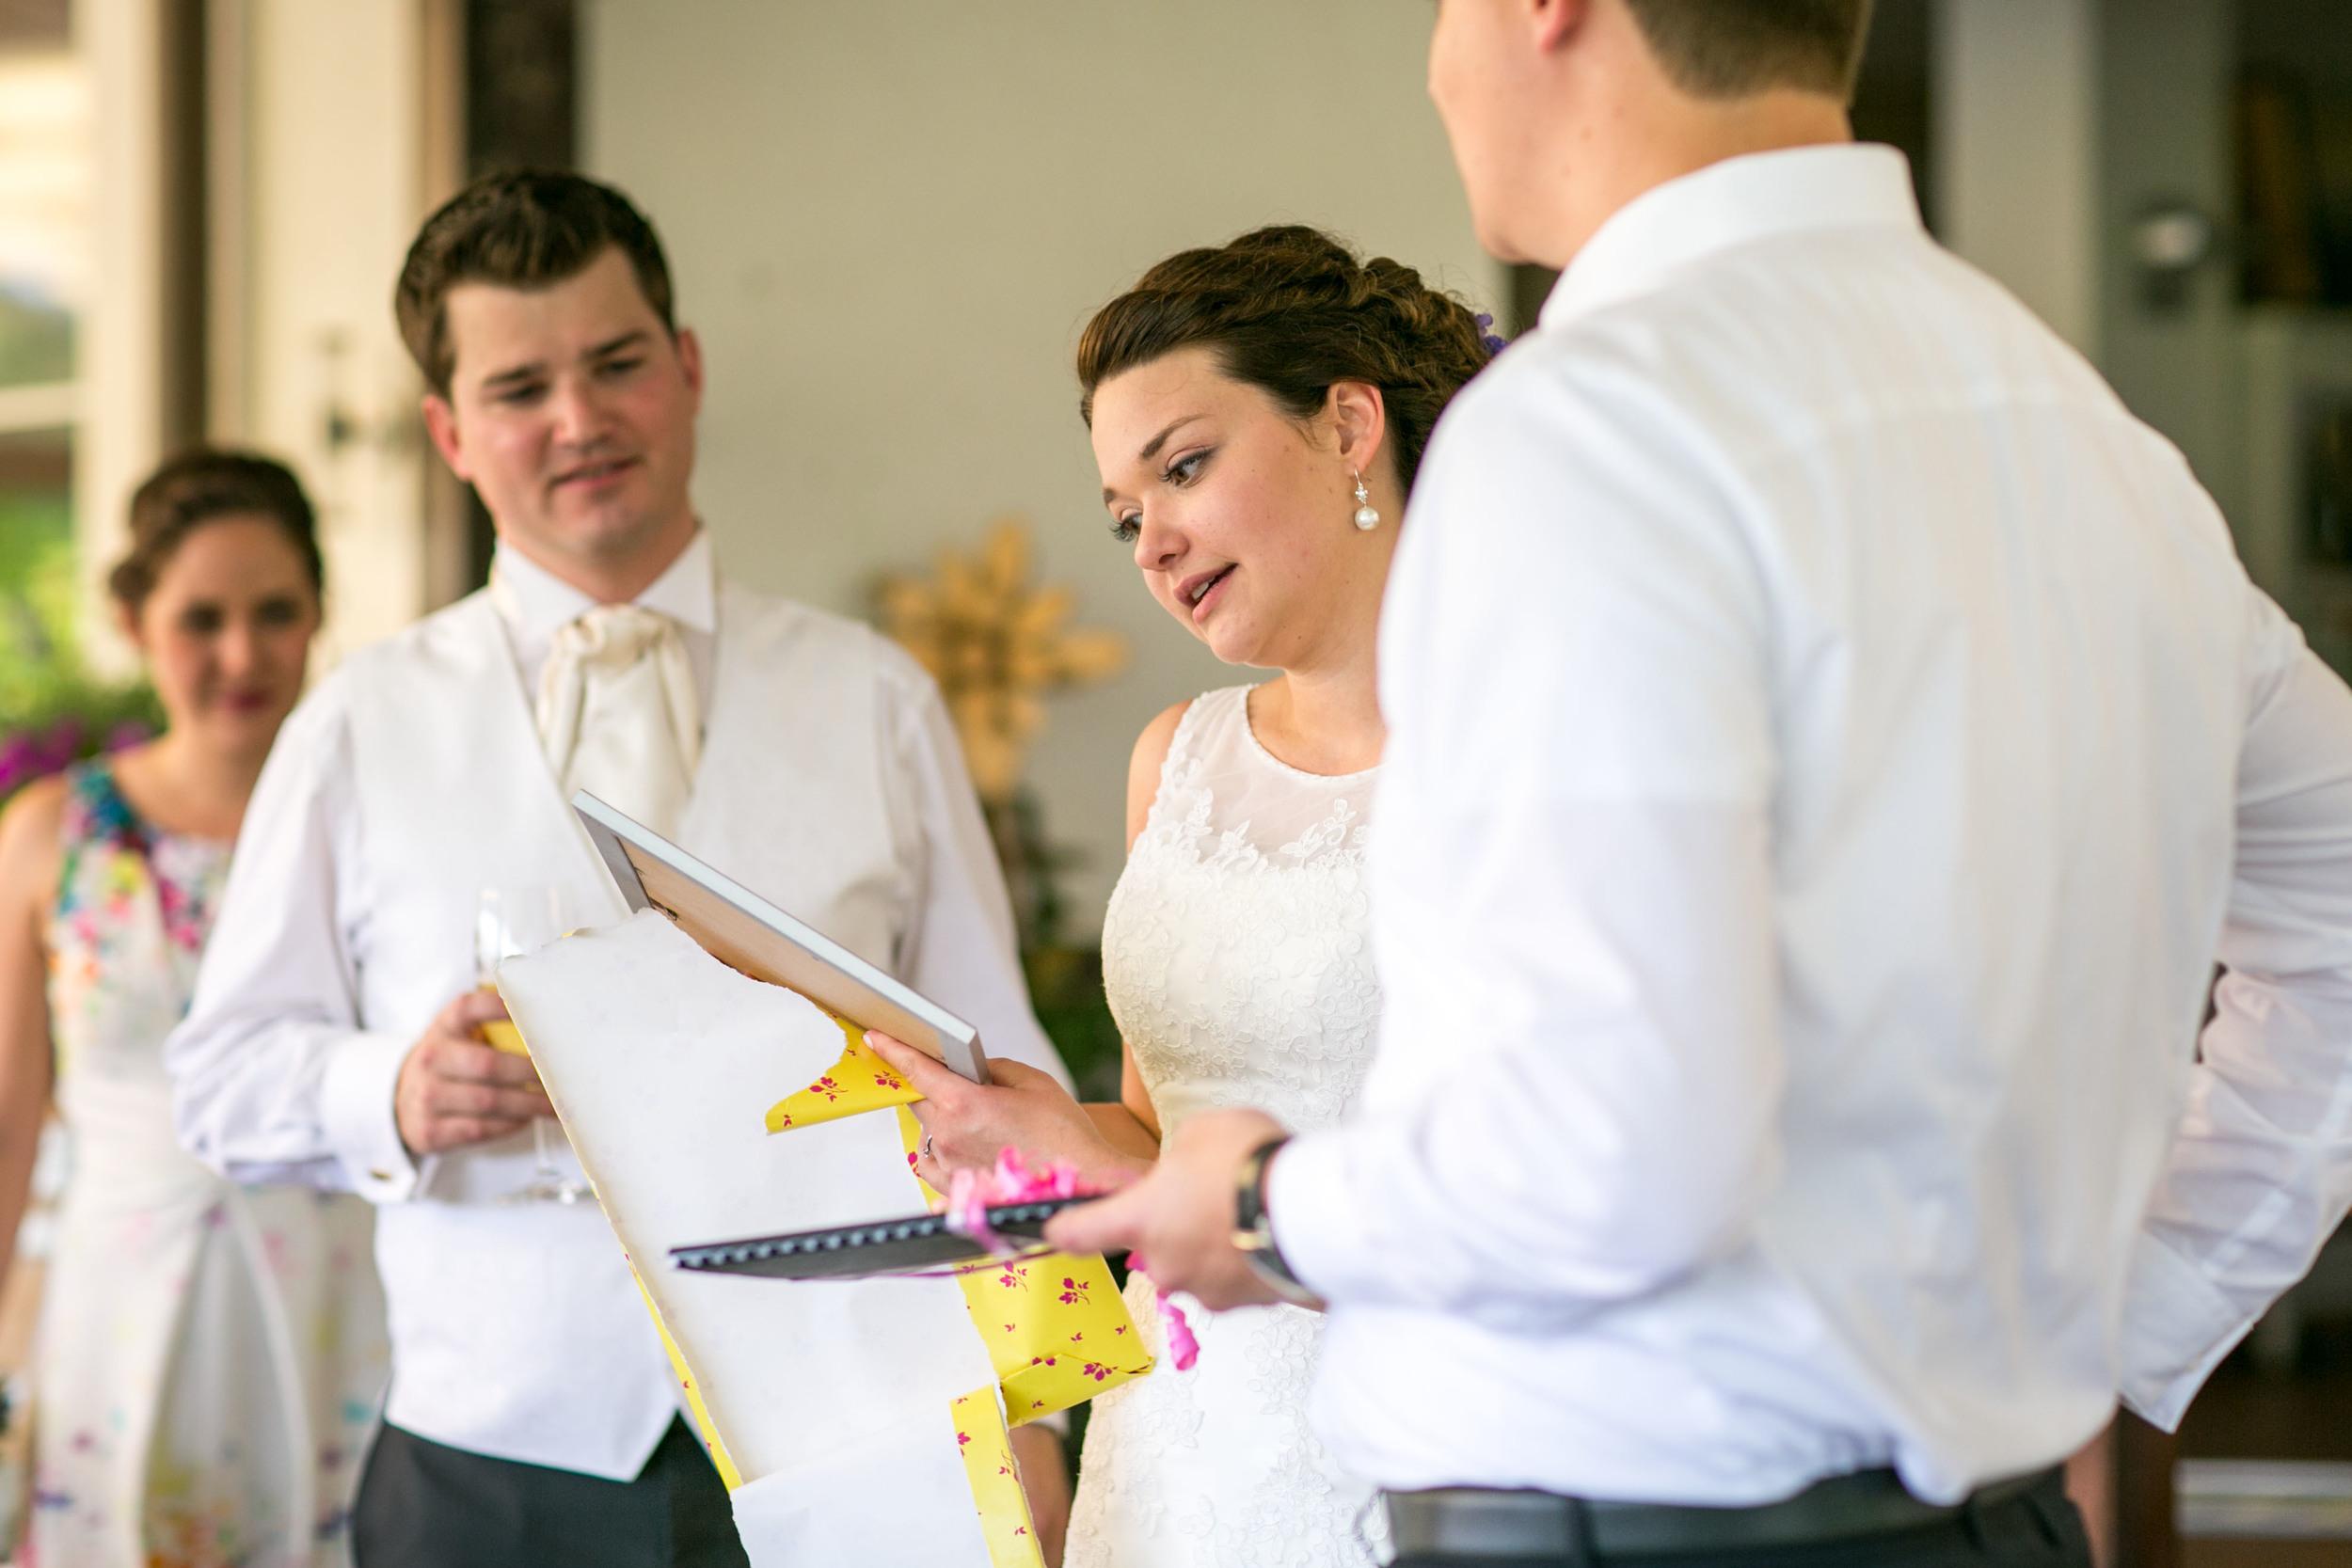 Hochzeitsfotografie Berlin_Fran Burrows Fotografie-301.jpg